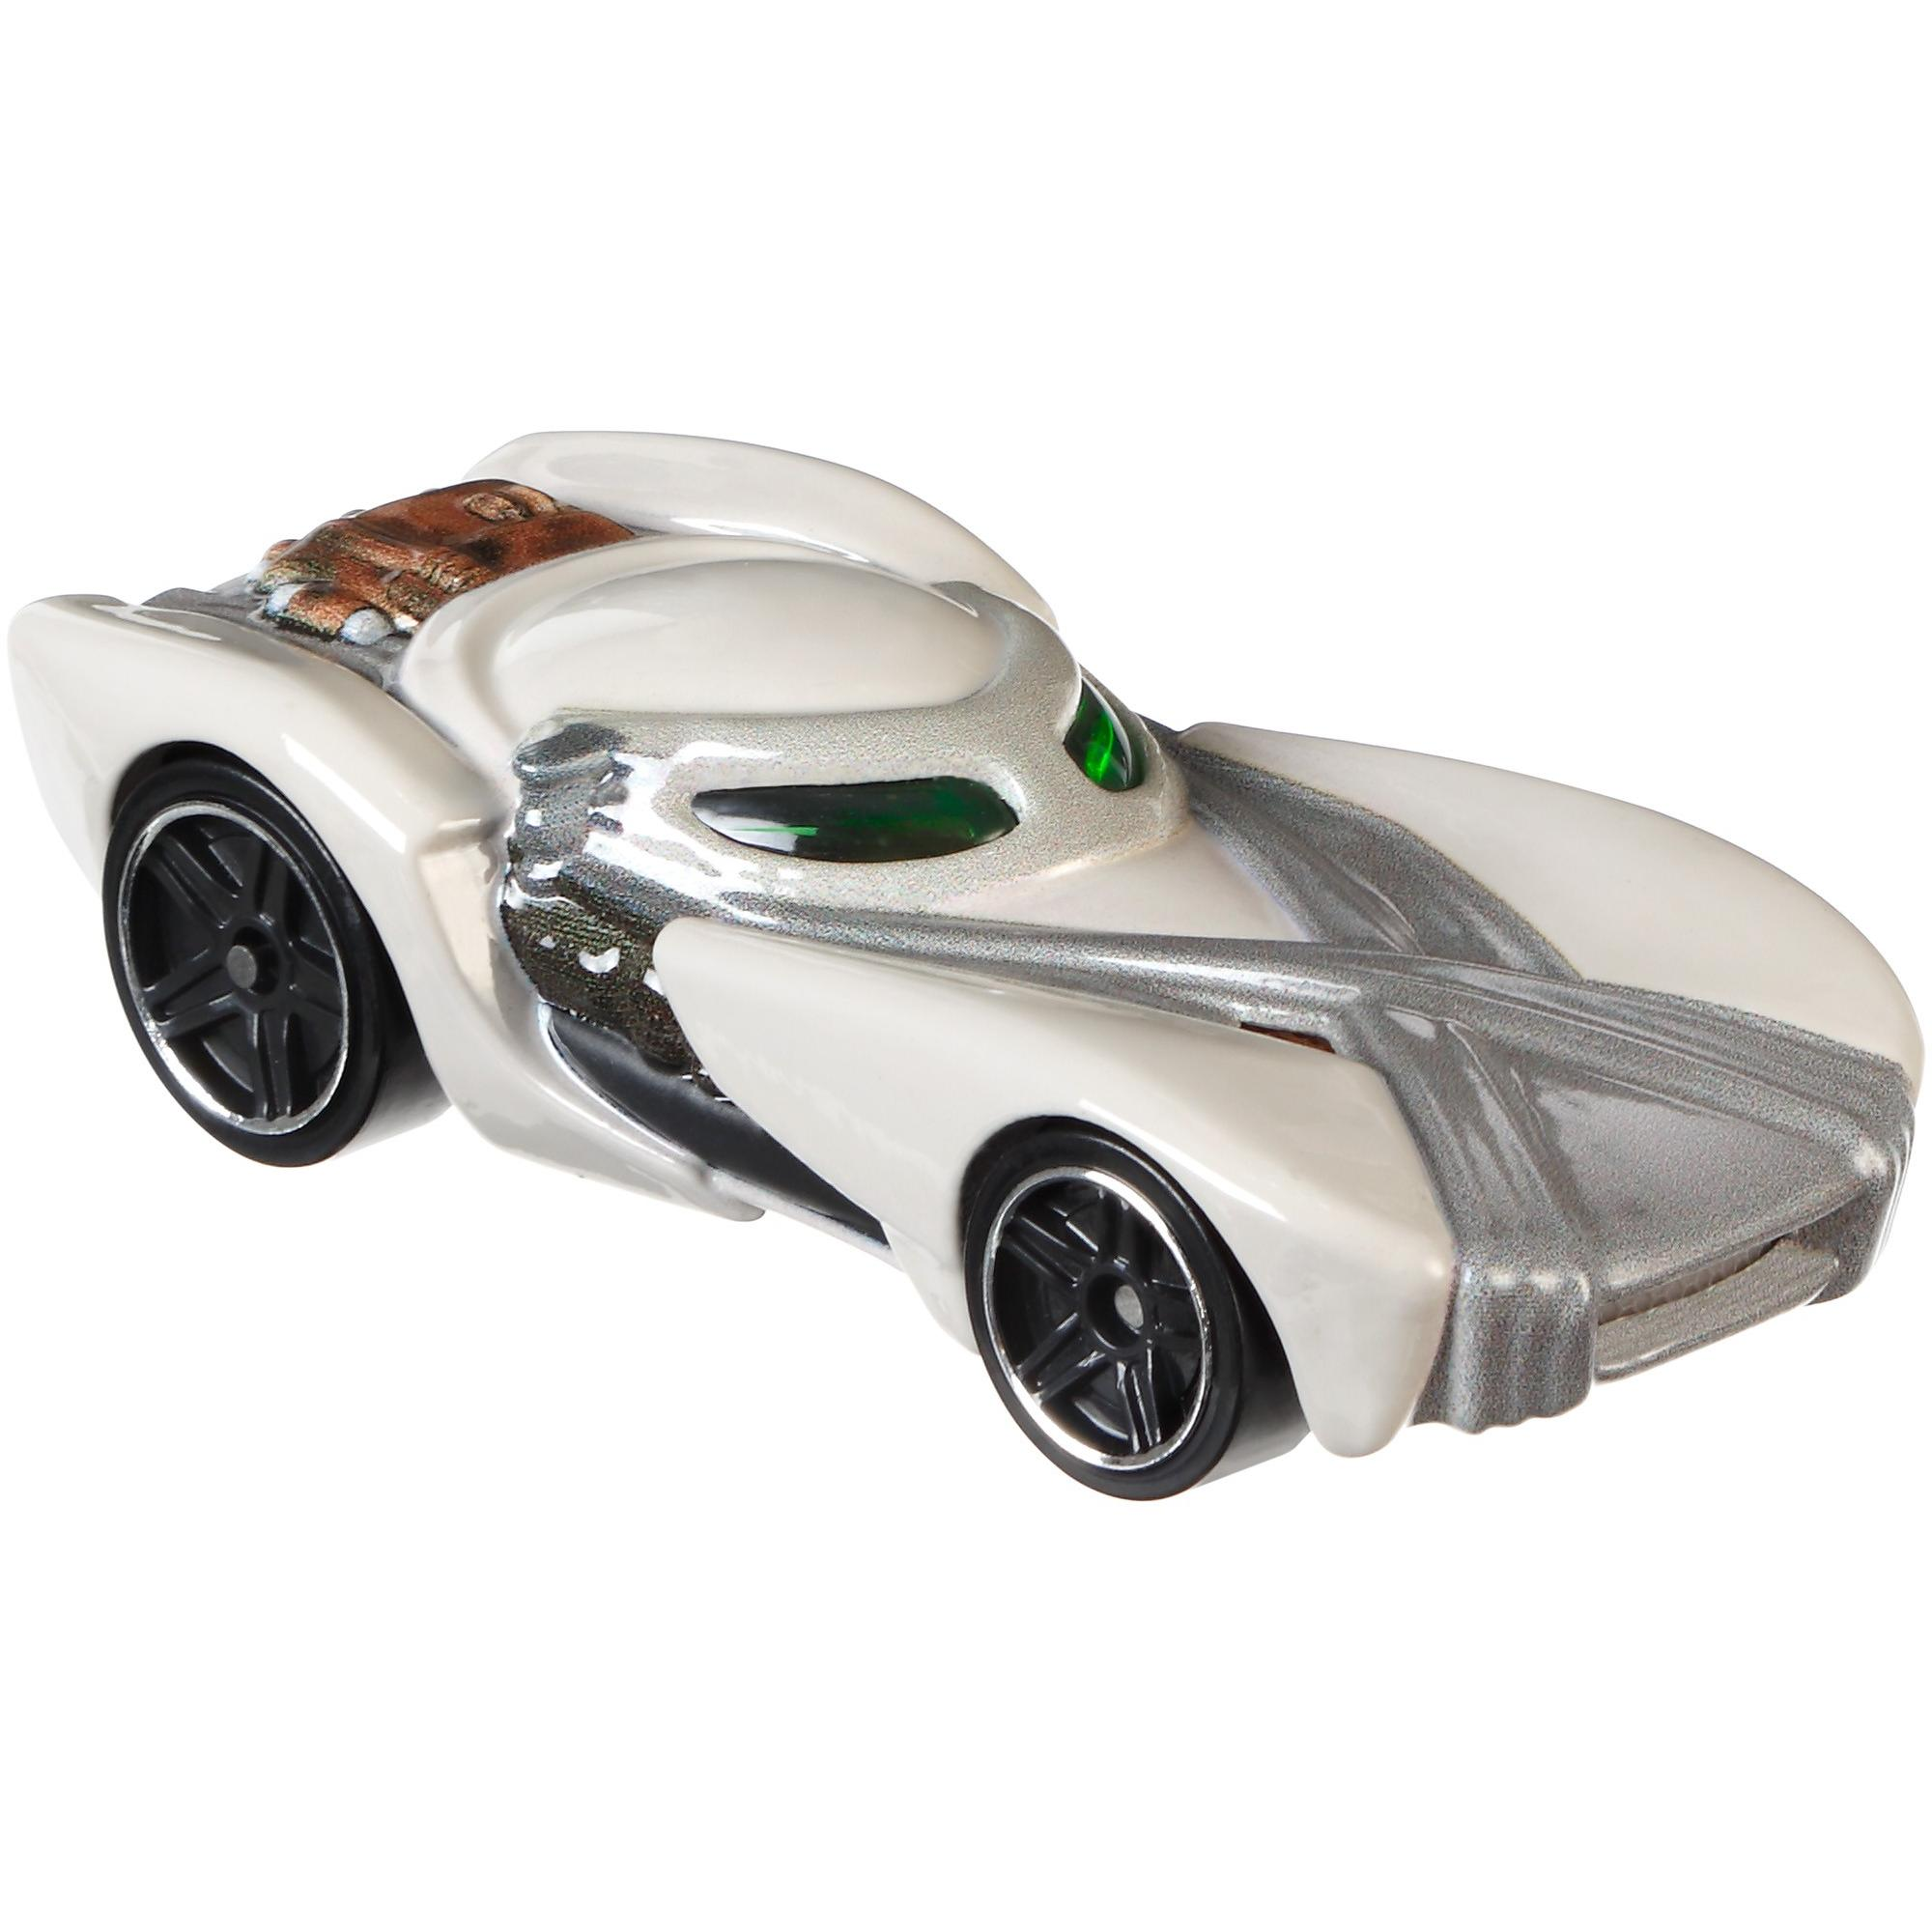 Hot Wheels Star Wars Rey Character Car